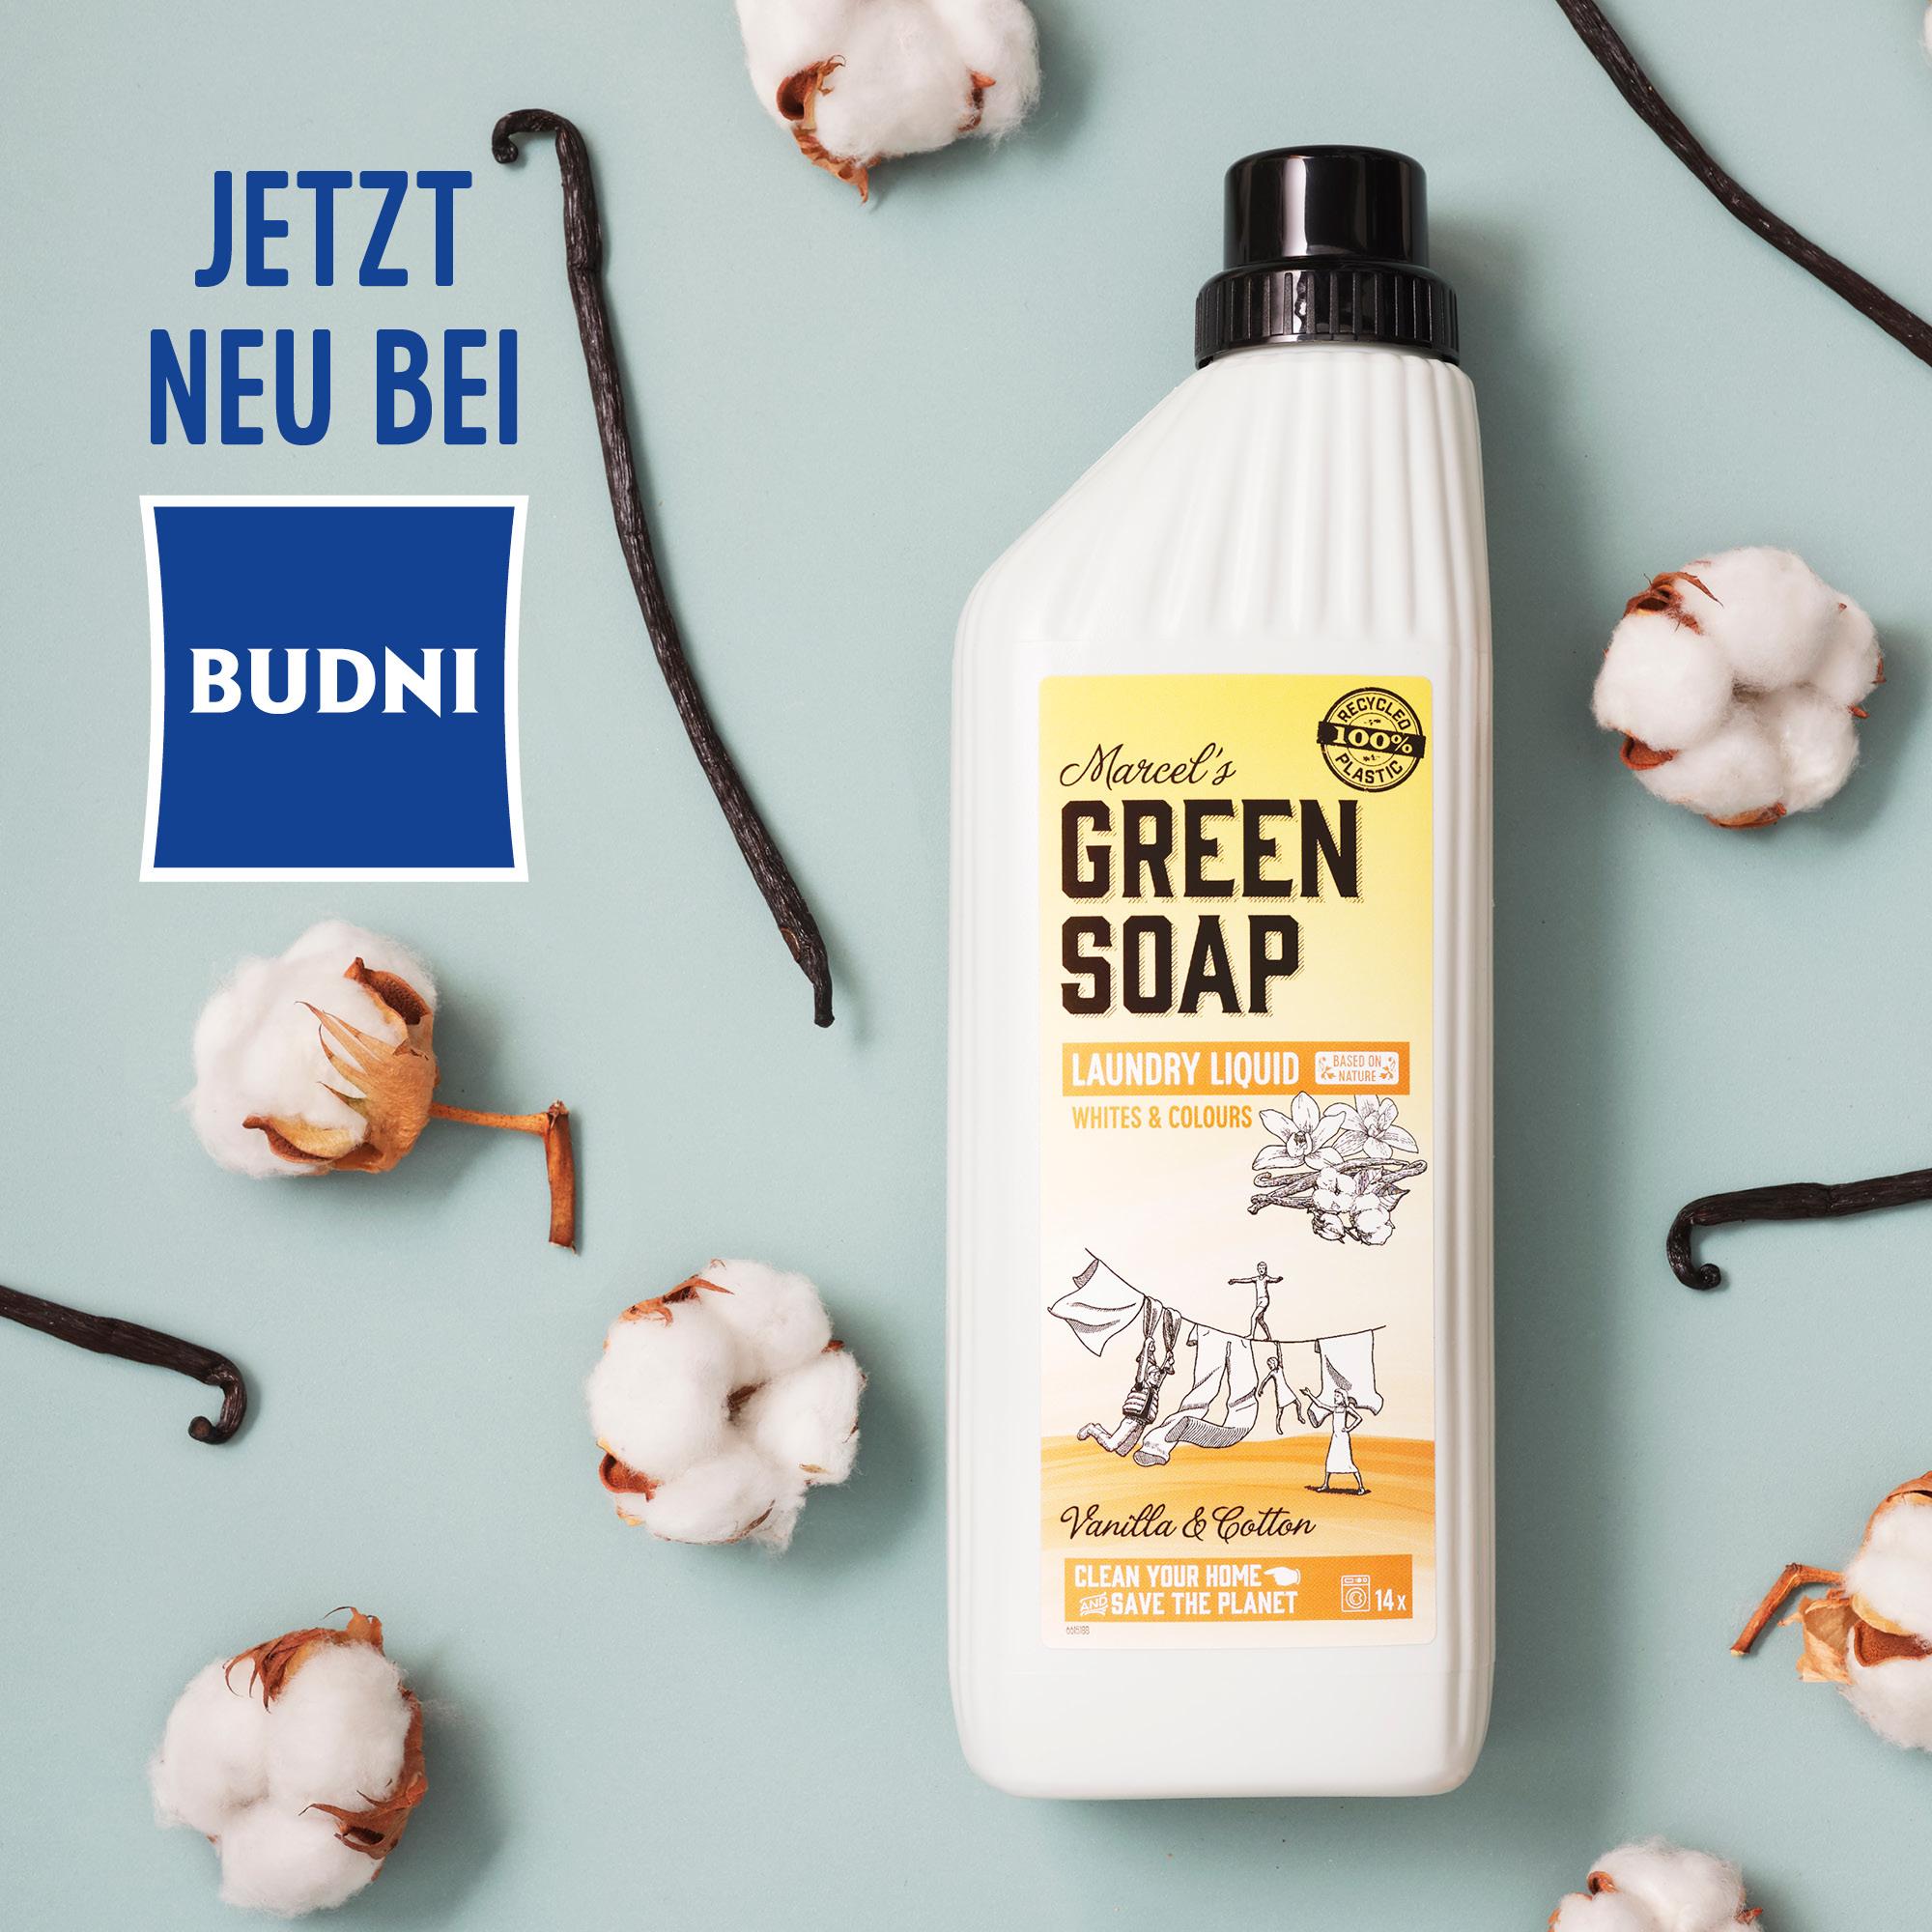 Marcel's Green Soap jetzt neu bei Budni Hamburg